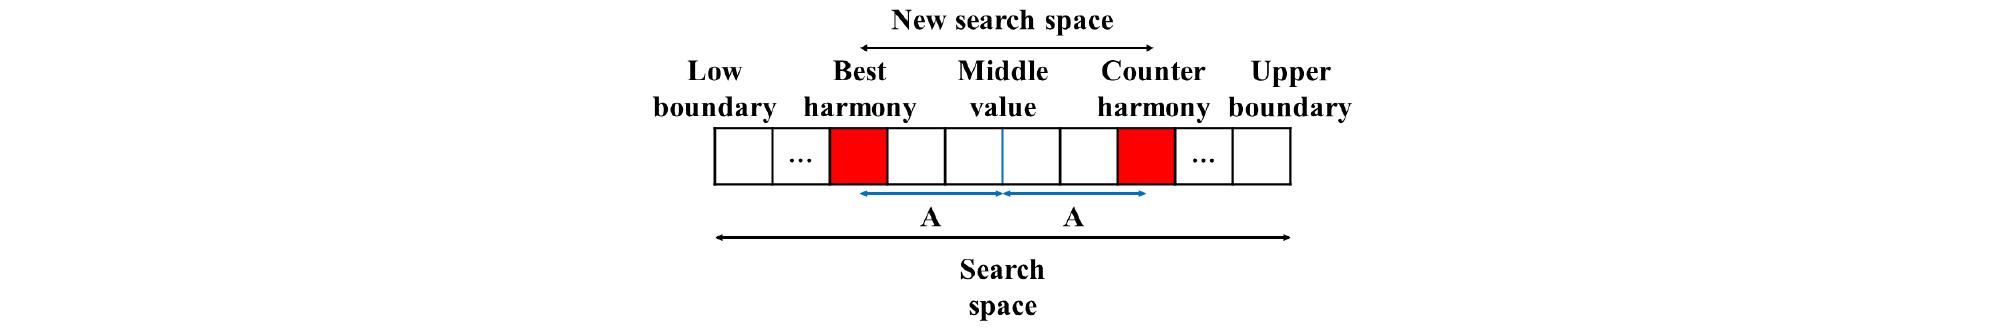 http://static.apub.kr/journalsite/sites/kwra/2020-053-08/N0200530803/images/kwra_53_08_03_F2.jpg